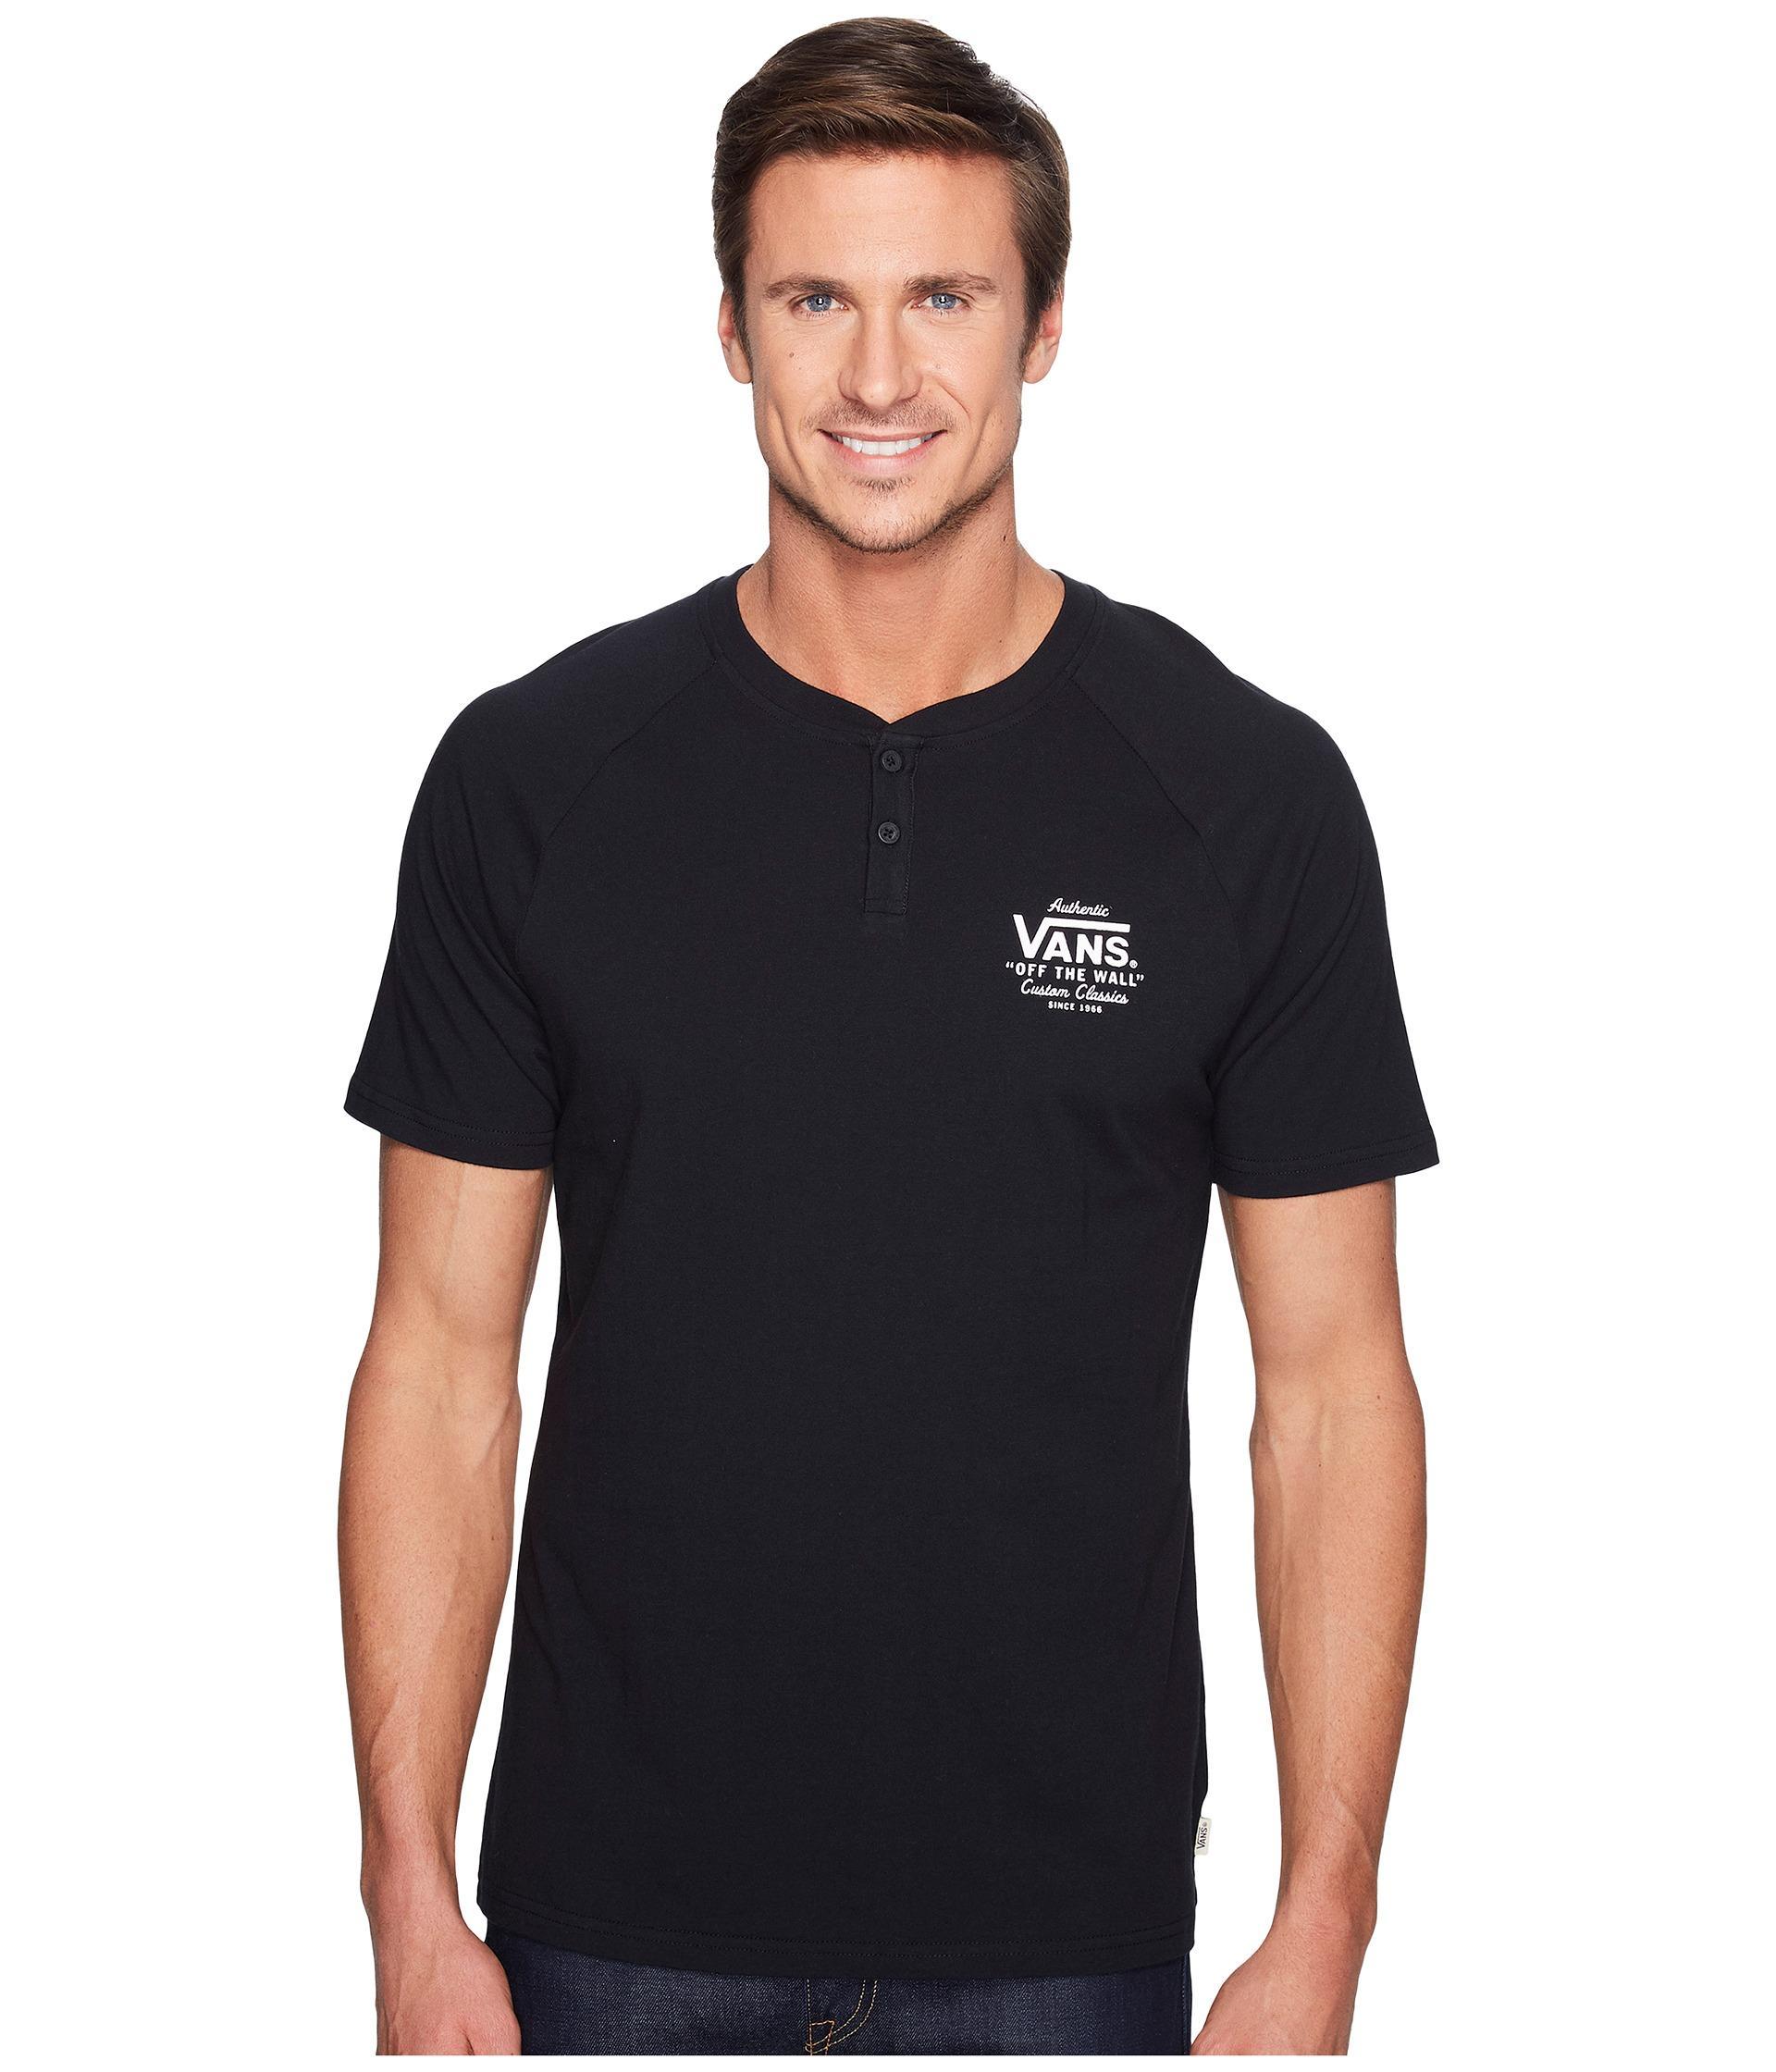 95a7549b2a Lyst - Vans Holder Street Short Sleeve Henley in Black for Men